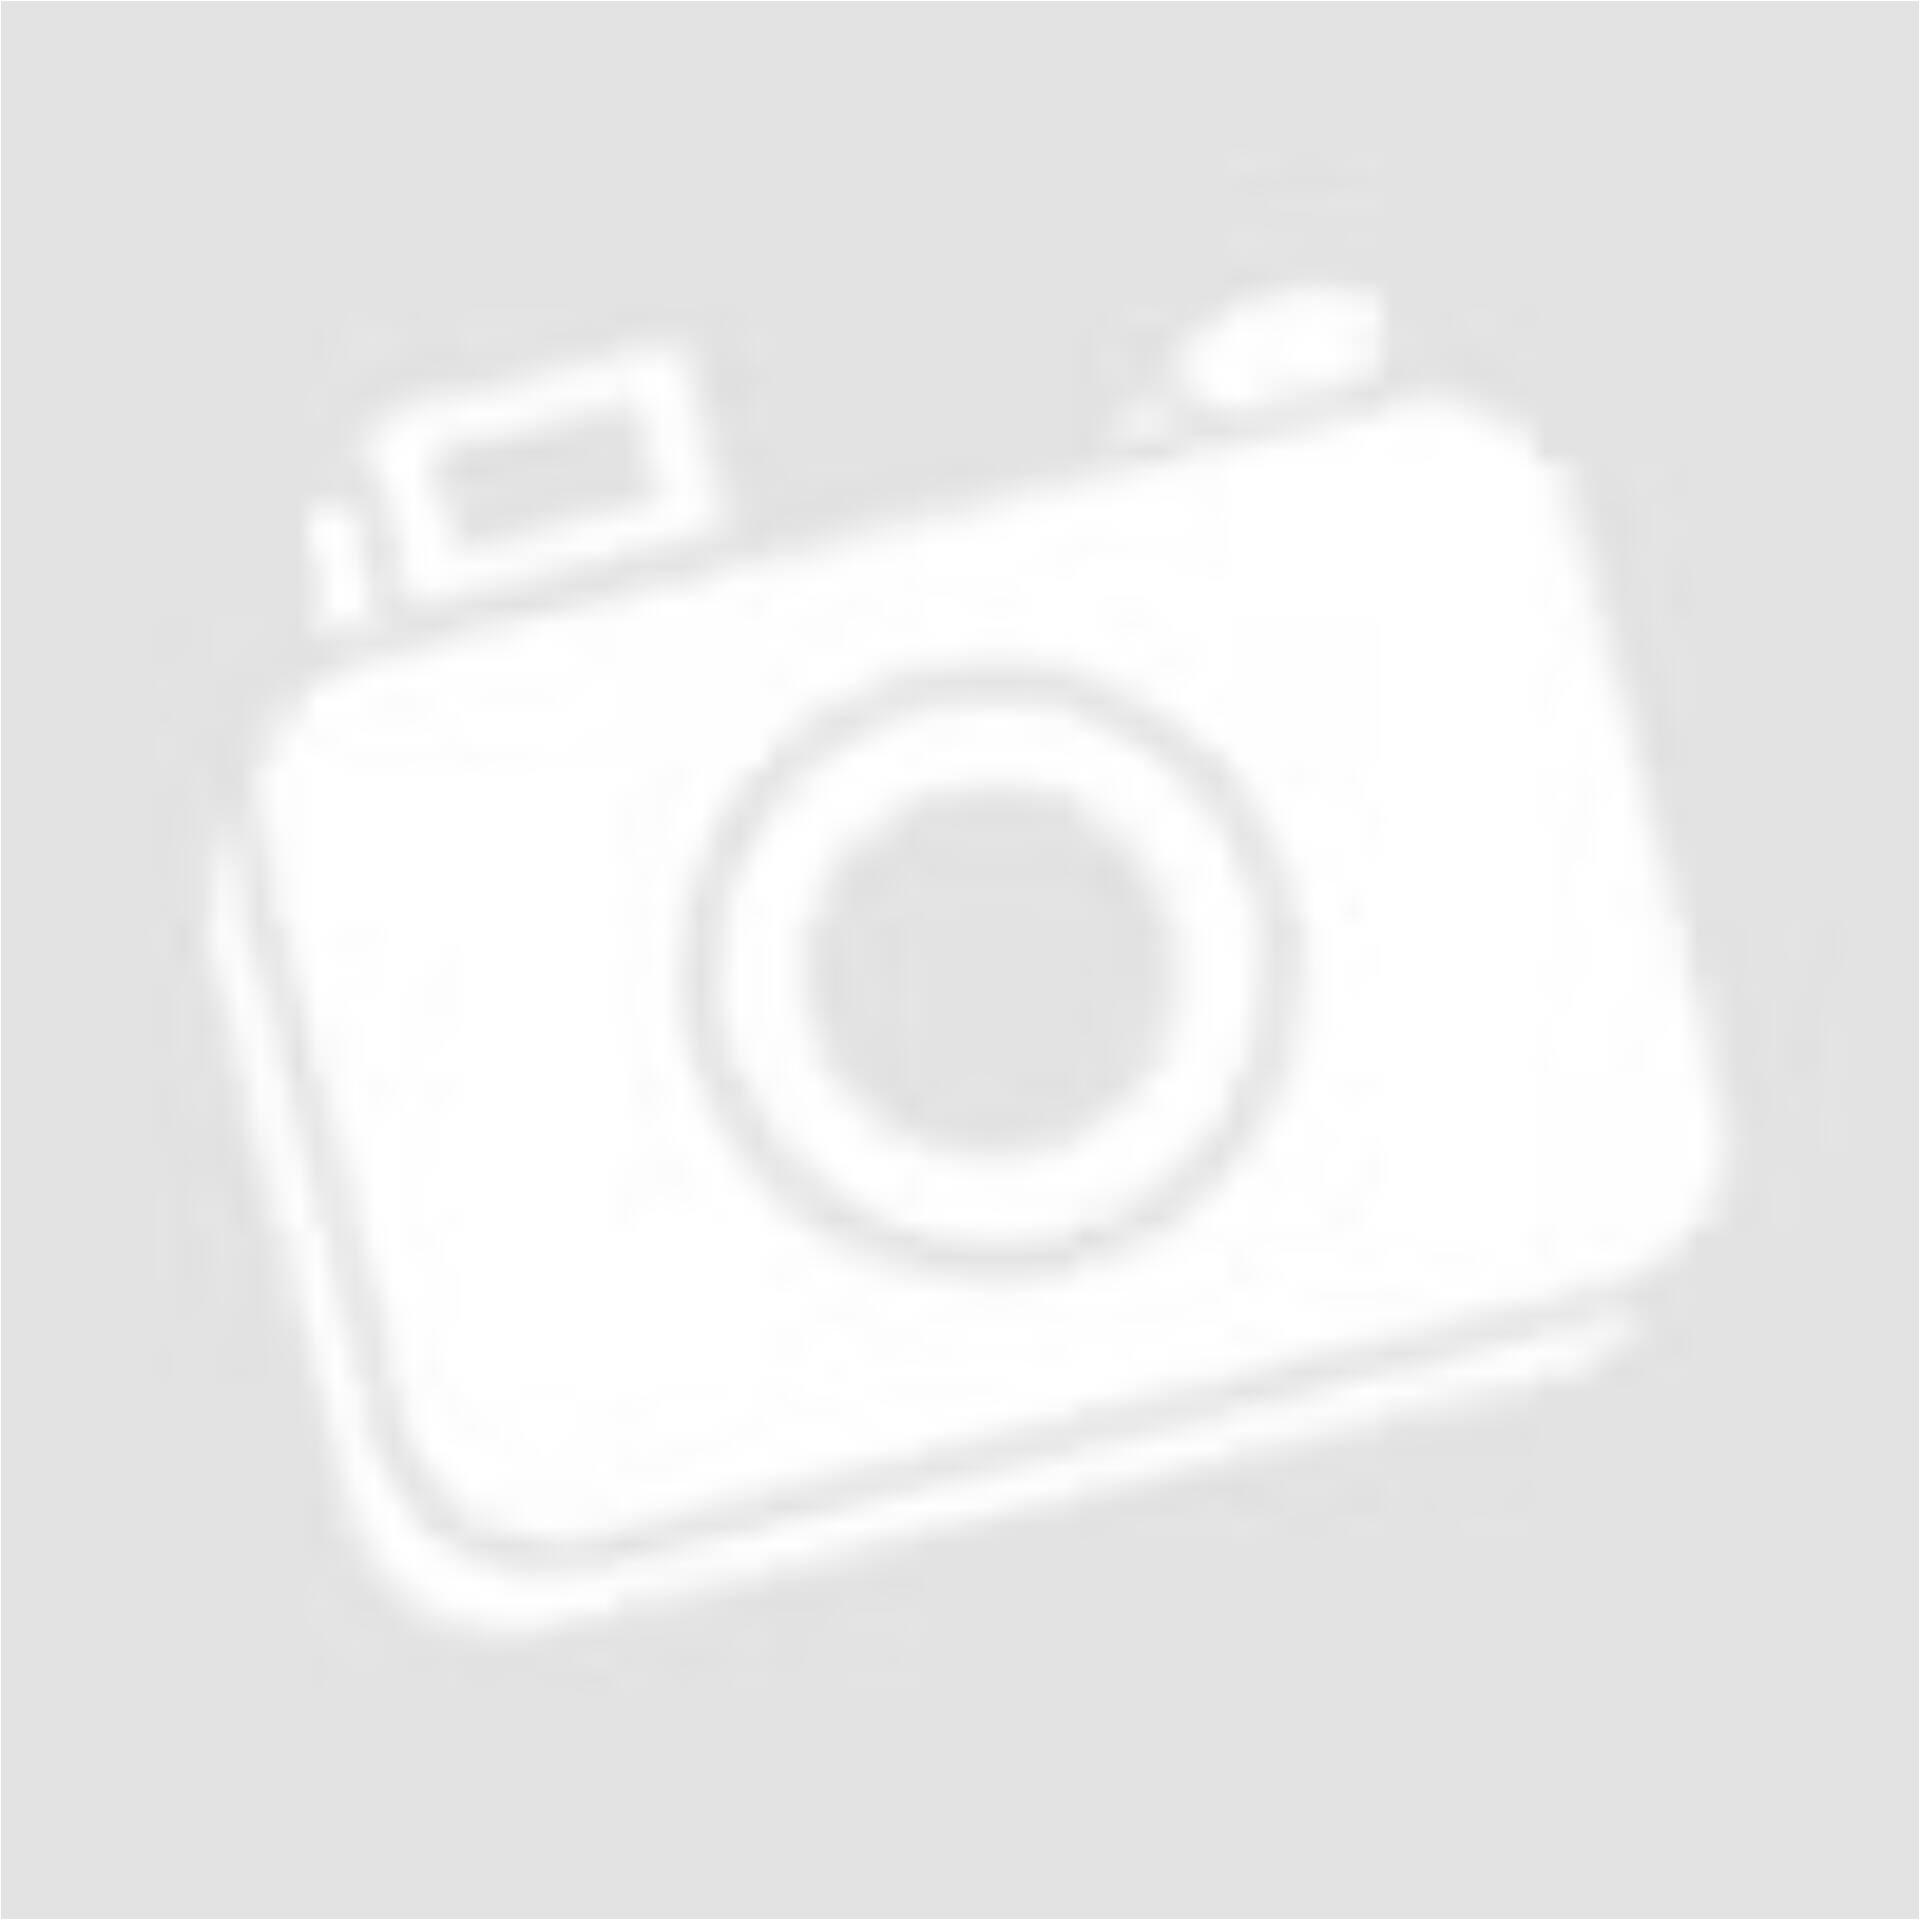 3142b2da234a ANGELO LITRICO kék divatos ing (Méret: XL) - Ing - Öltözz ki ...